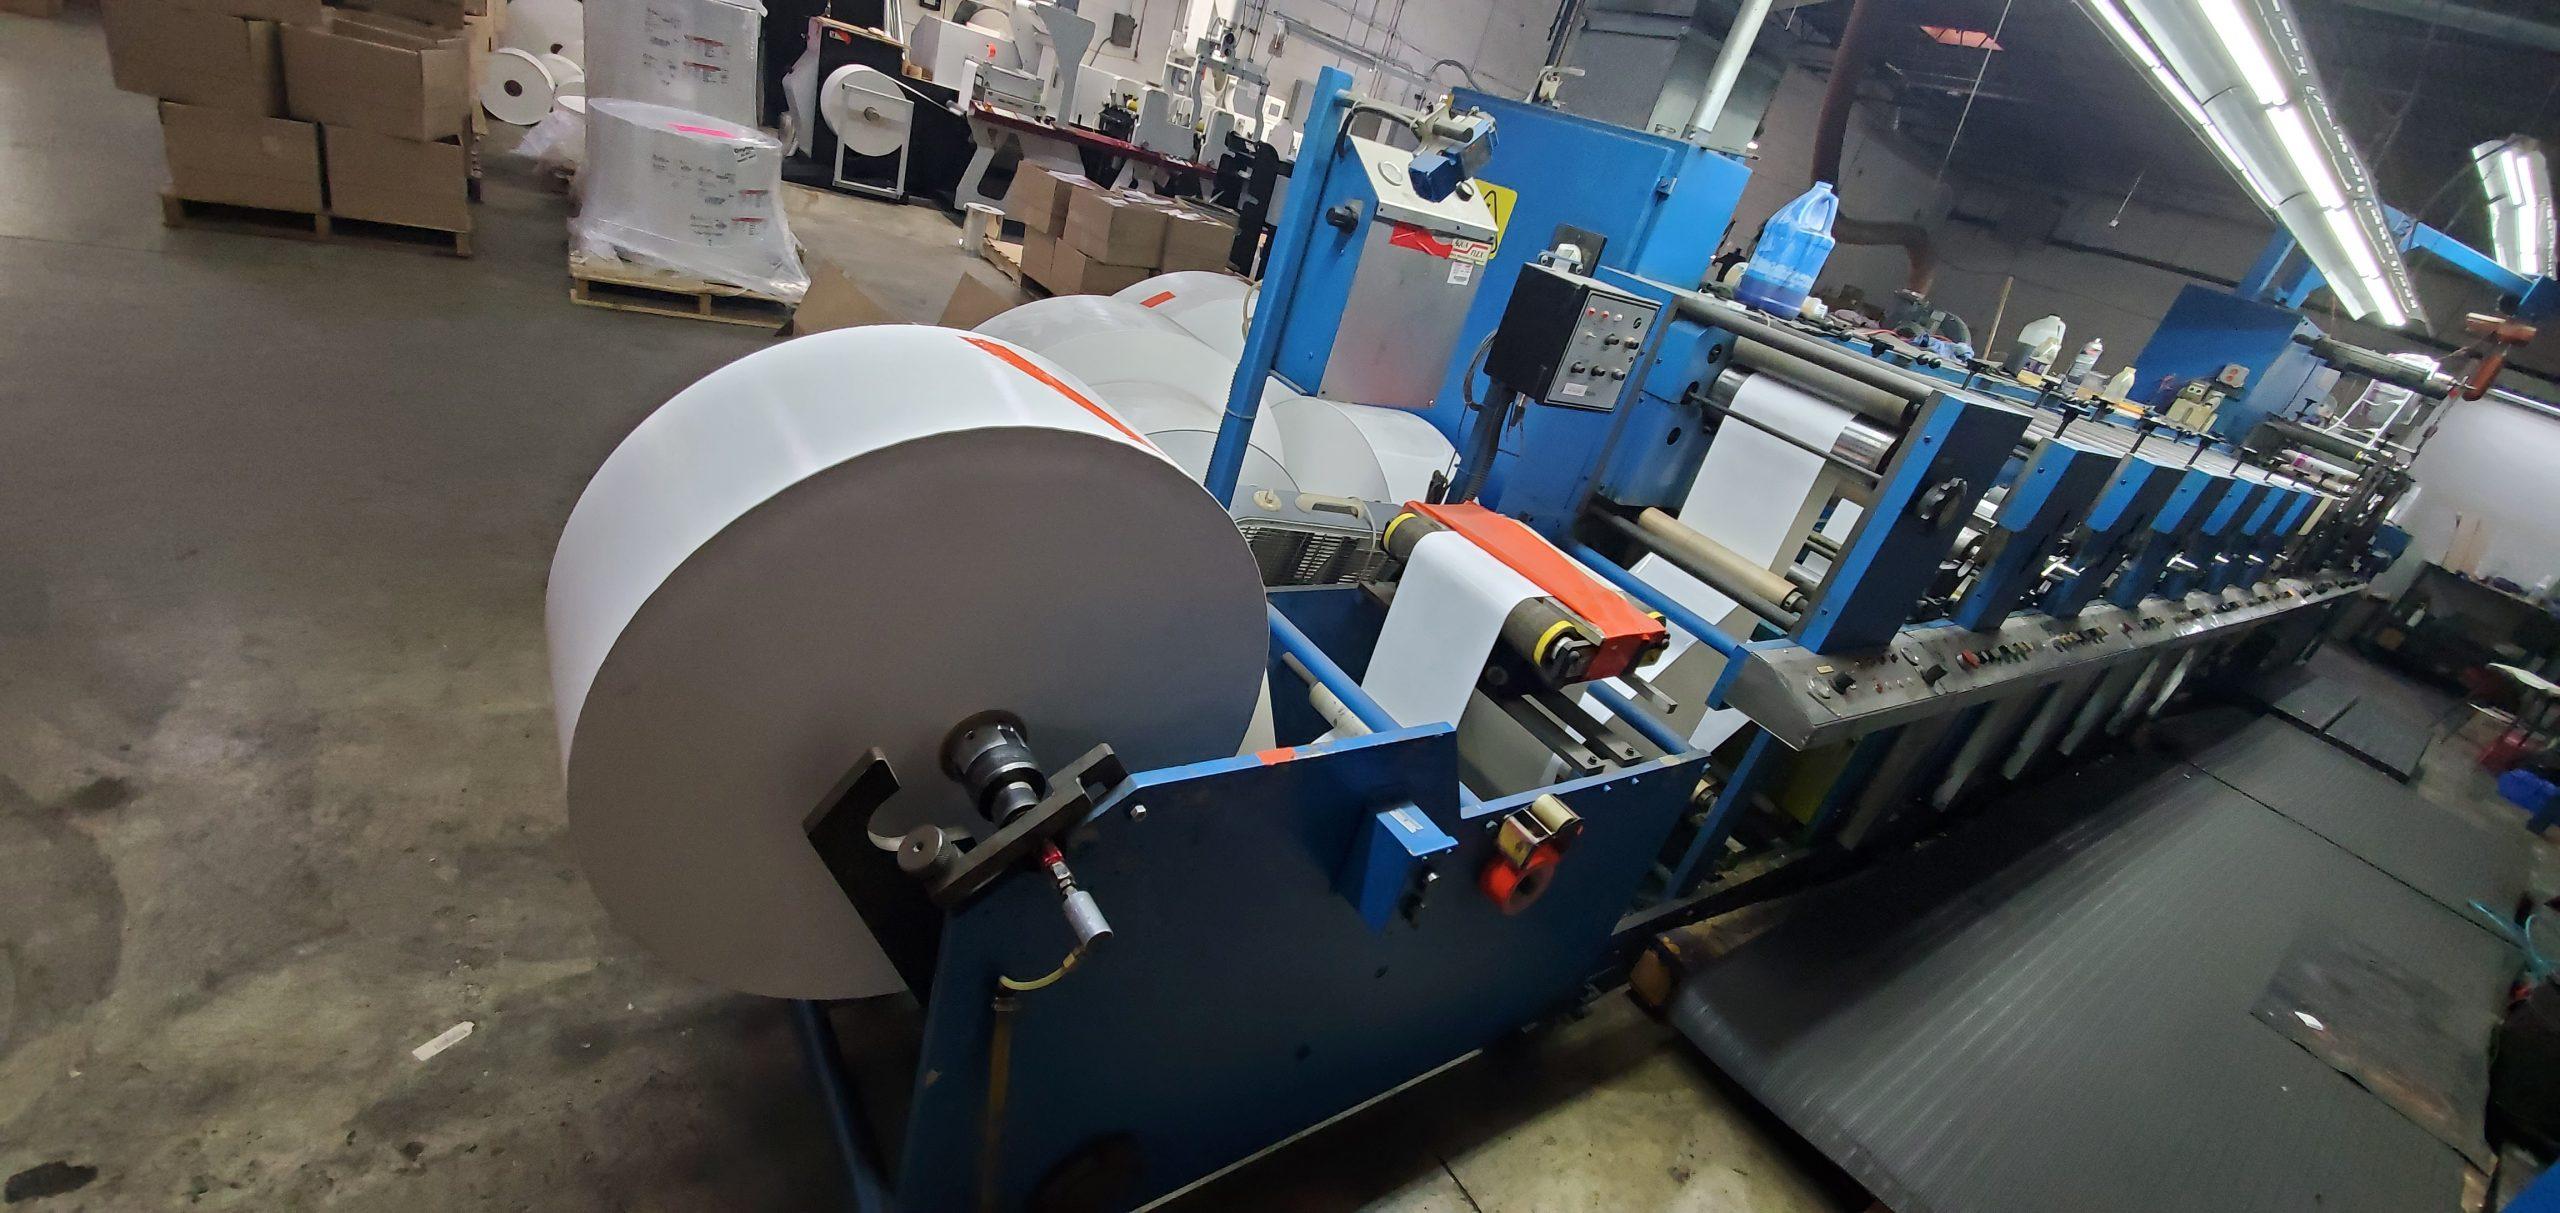 Aquaflex LWSP-1307 - Used Flexo Printing Presses and Used Flexographic Equipment-2